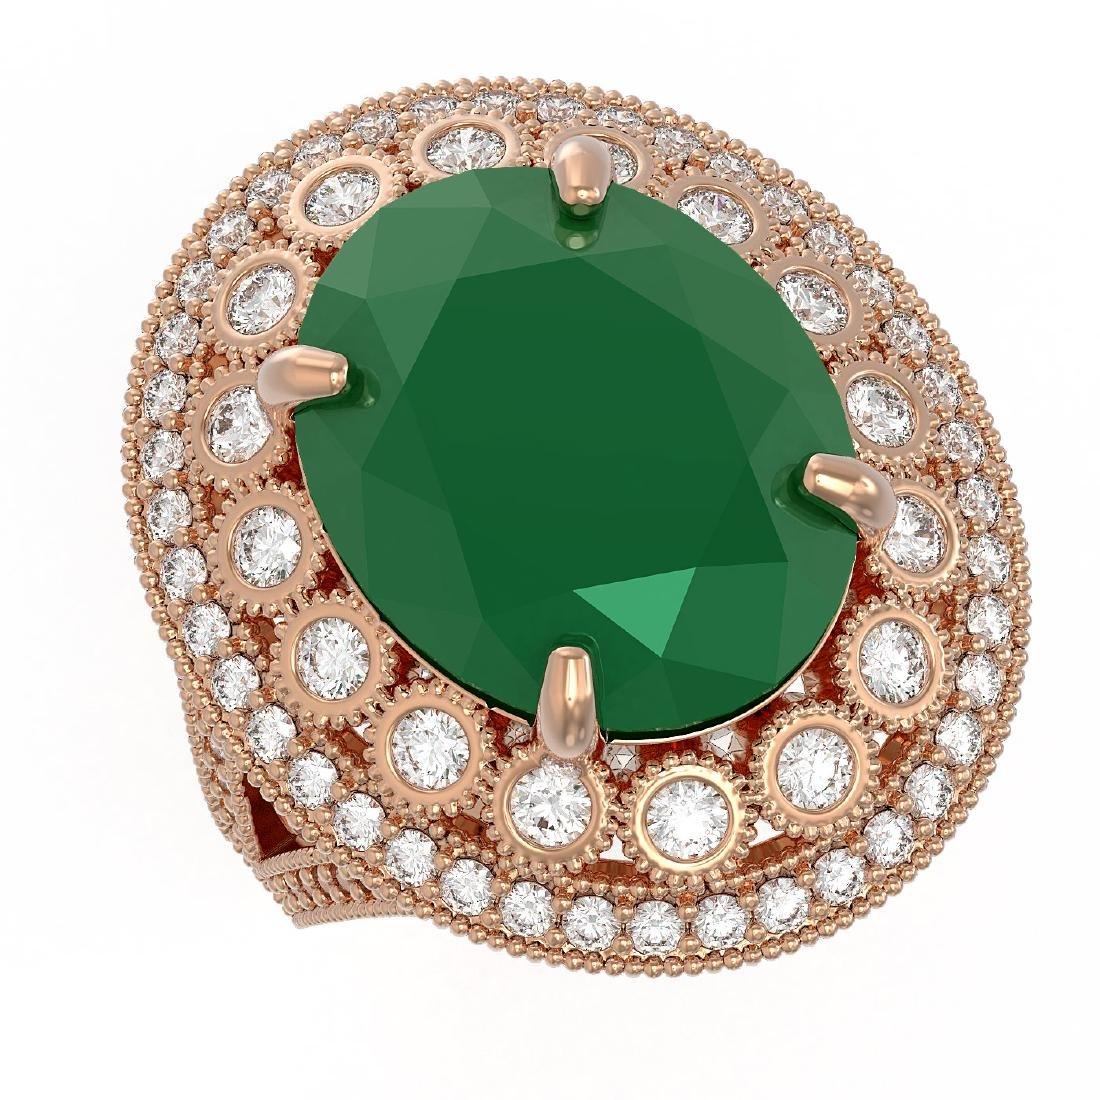 13.85 ctw Emerald & Diamond Victorian Ring 14K Rose